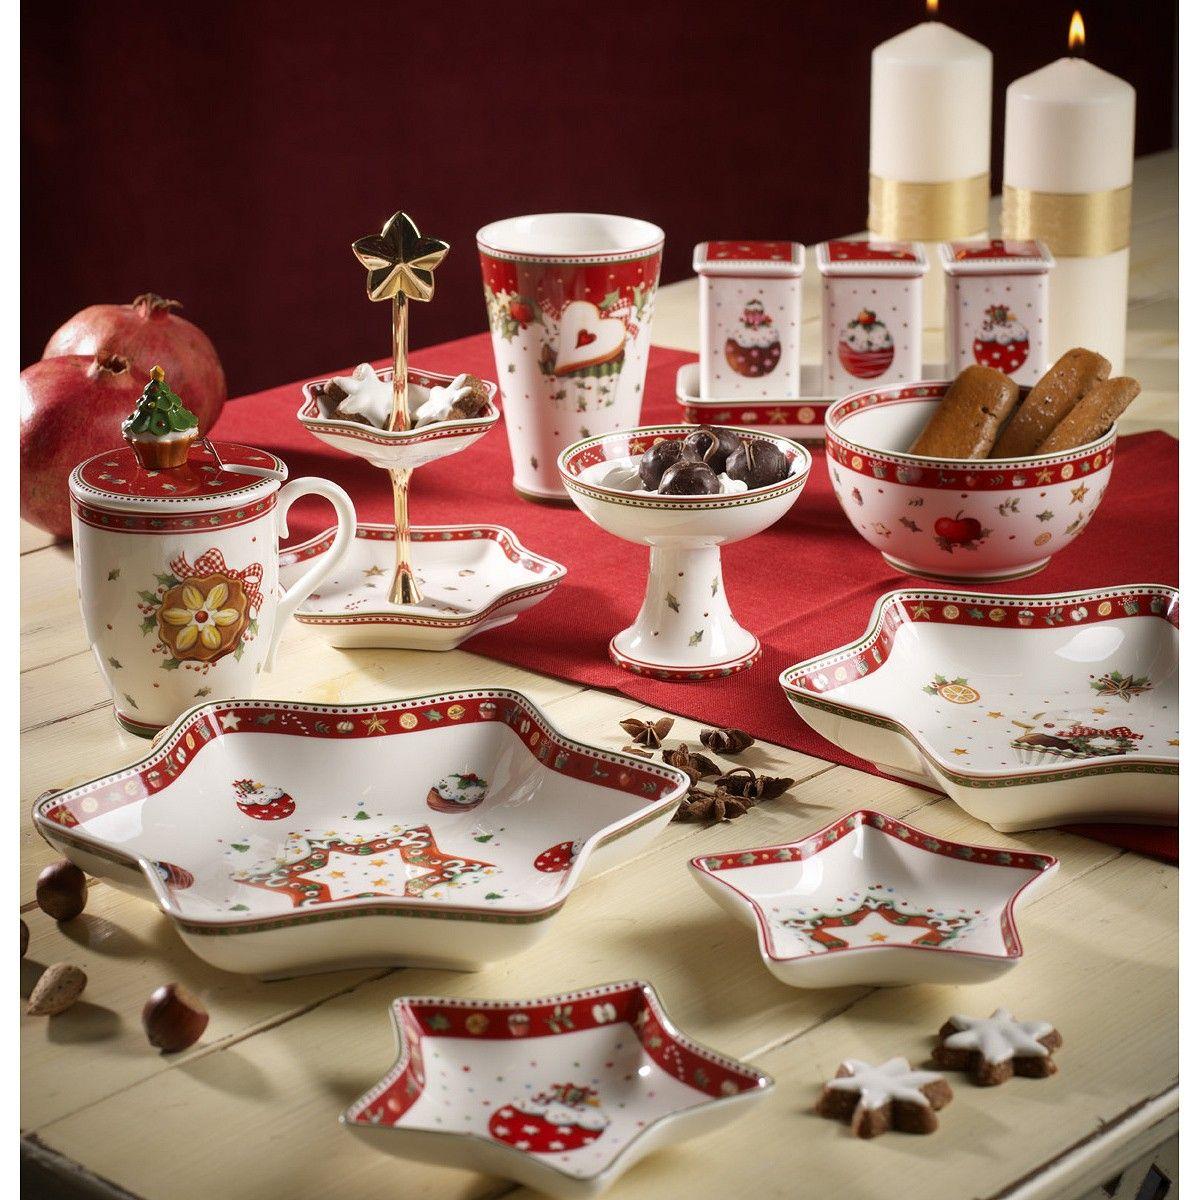 Deco Backery Delight Villeroy Christmas Tableware Christmas China Villeroy Boch